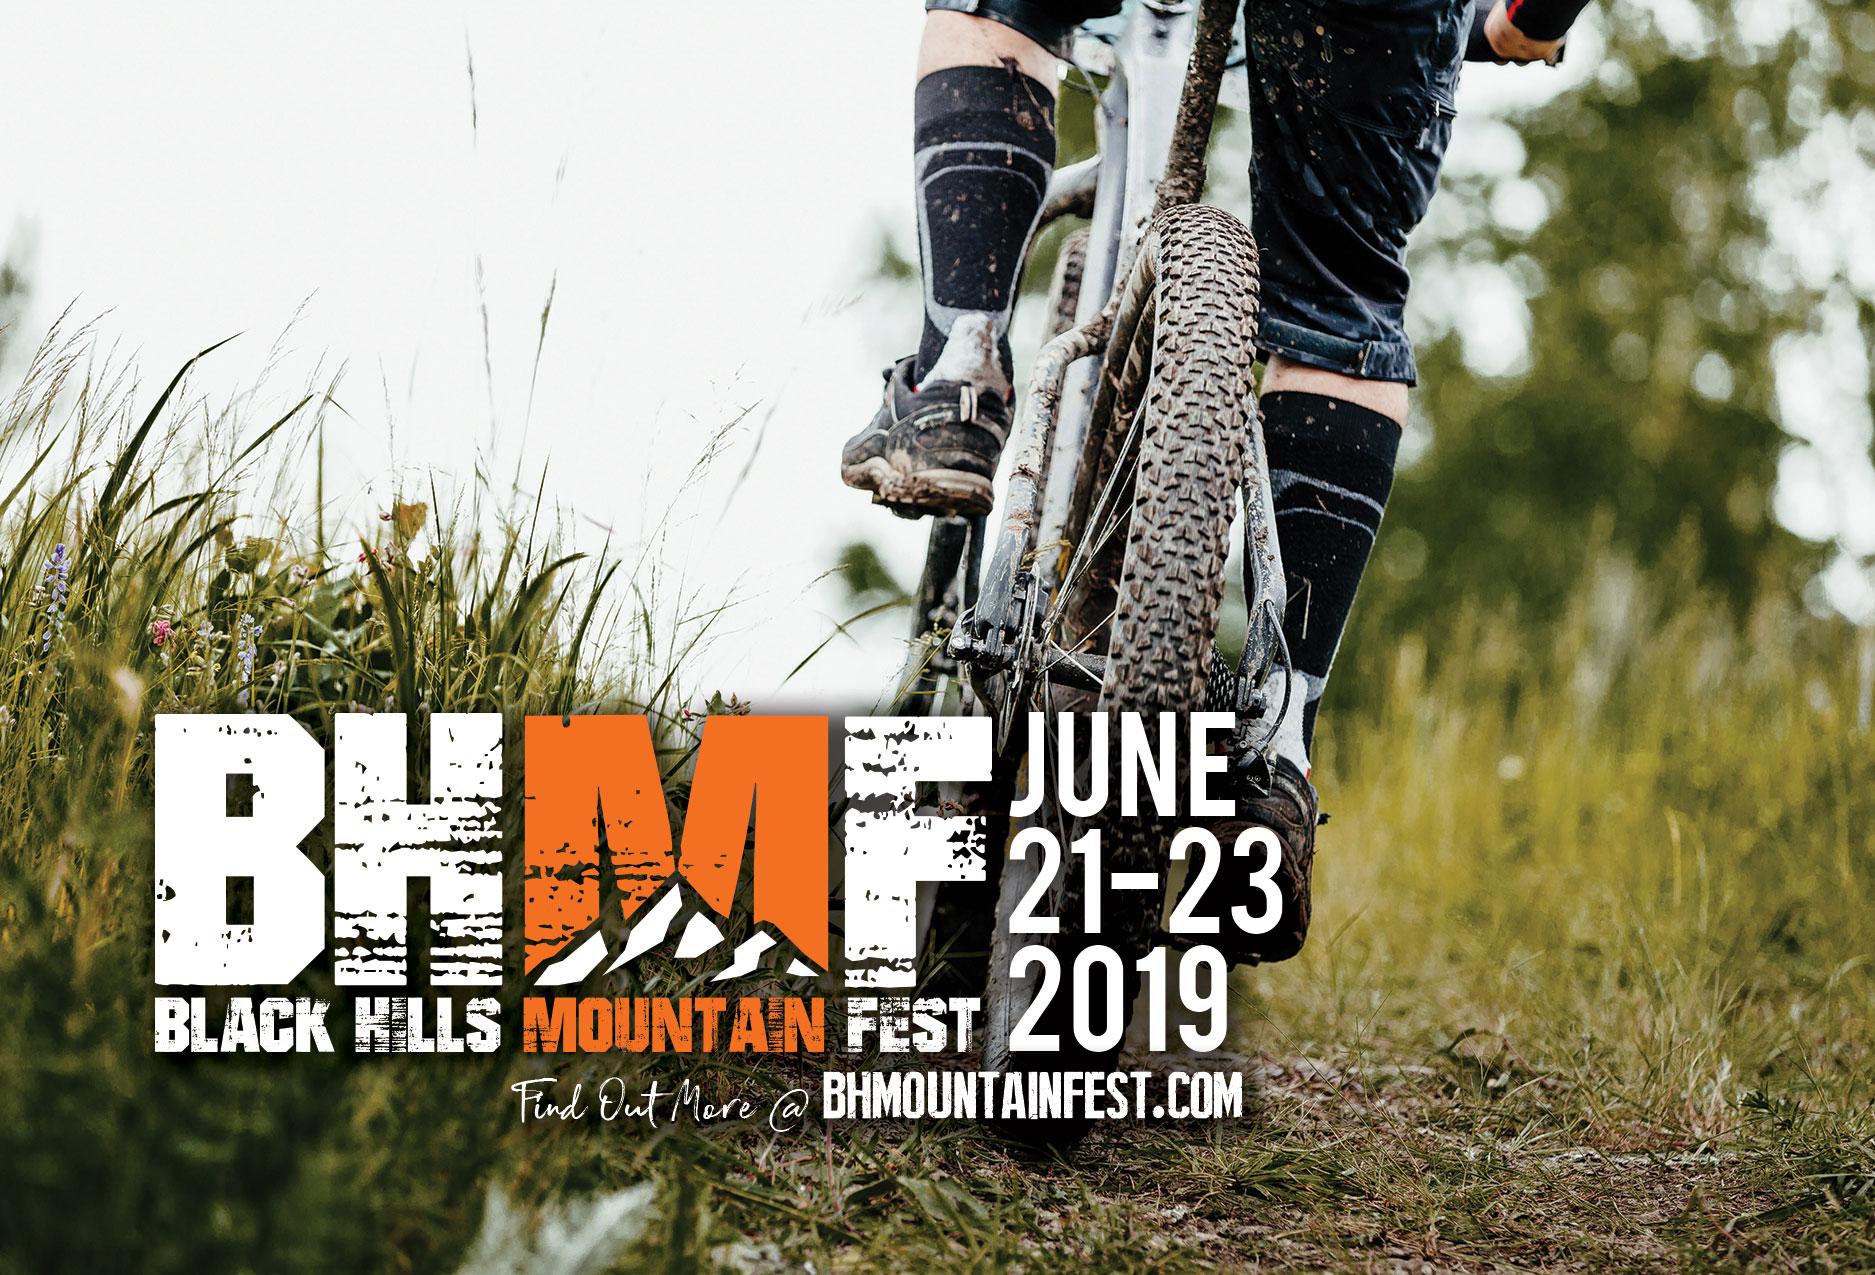 Black Hills Mountain Fest in Rapid City, SD